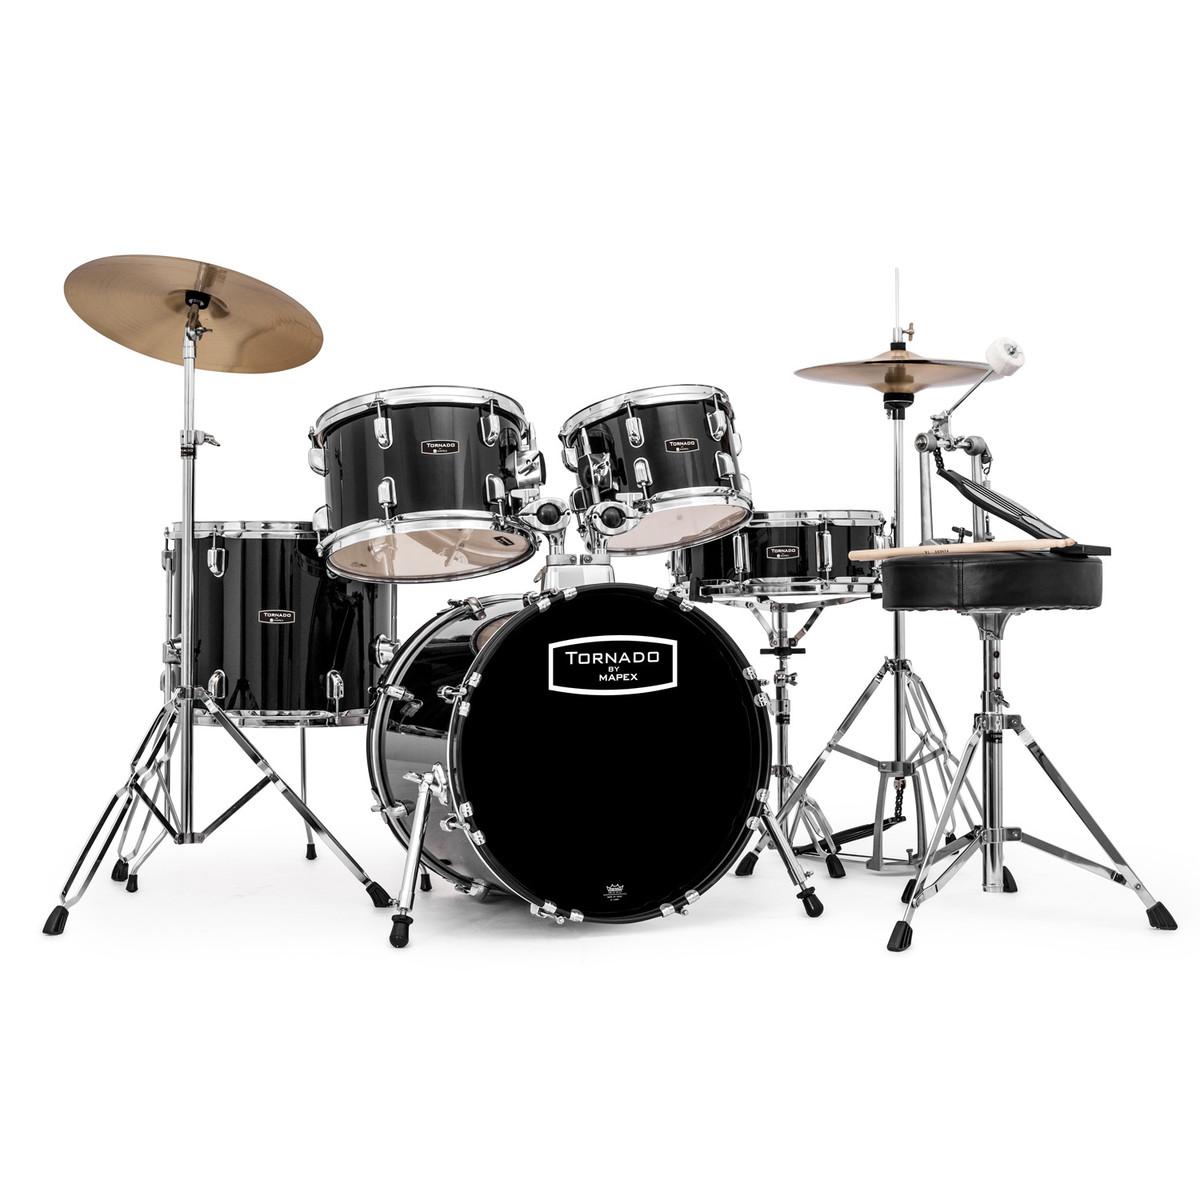 mapex tornado iii compact 18 drum kit black at gear4music. Black Bedroom Furniture Sets. Home Design Ideas